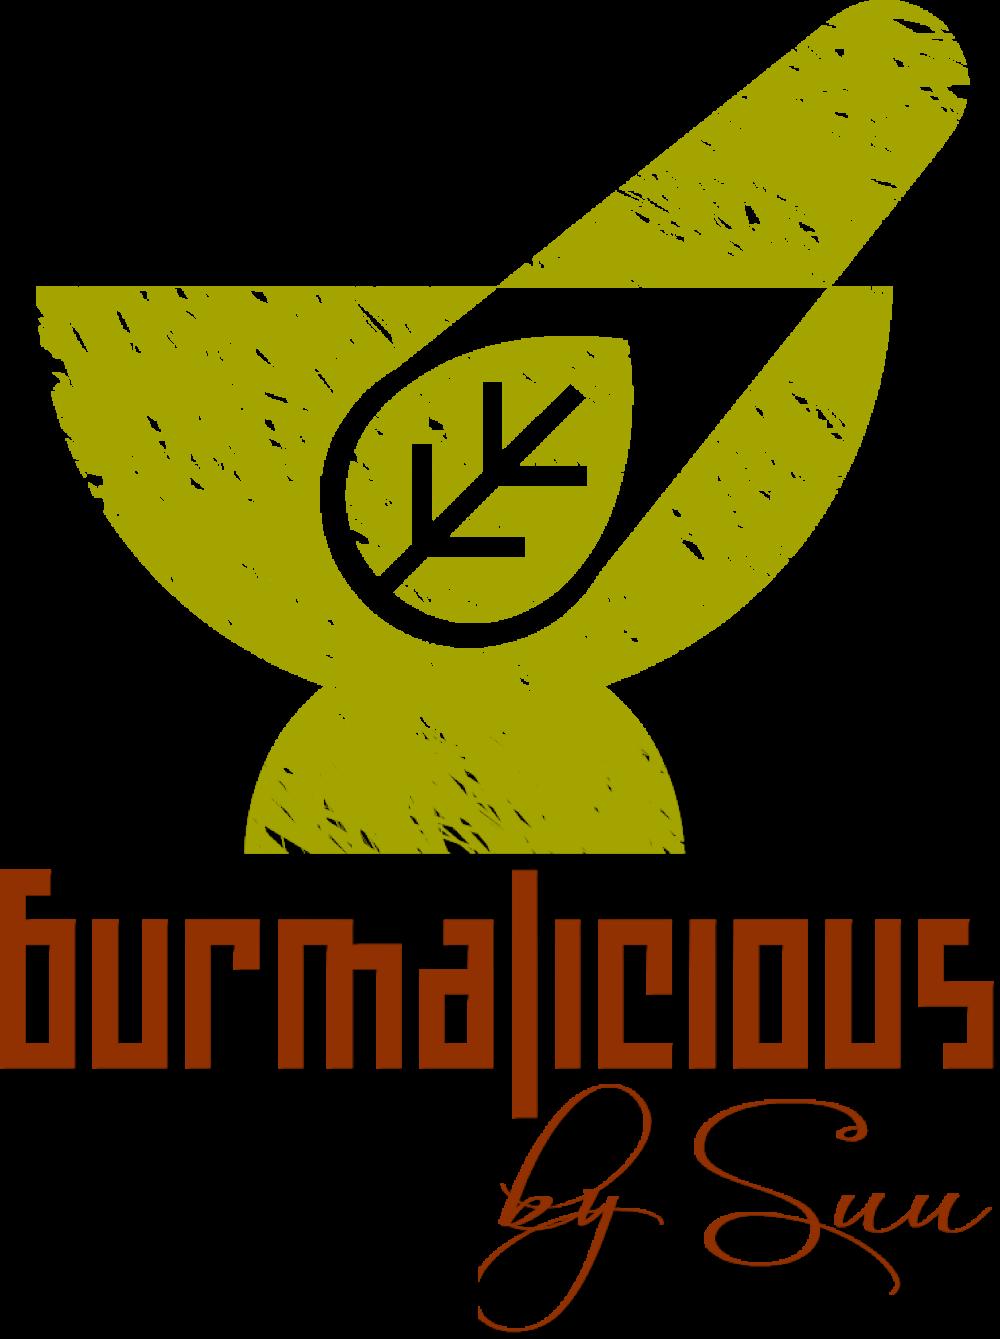 Burmalicious by Suu